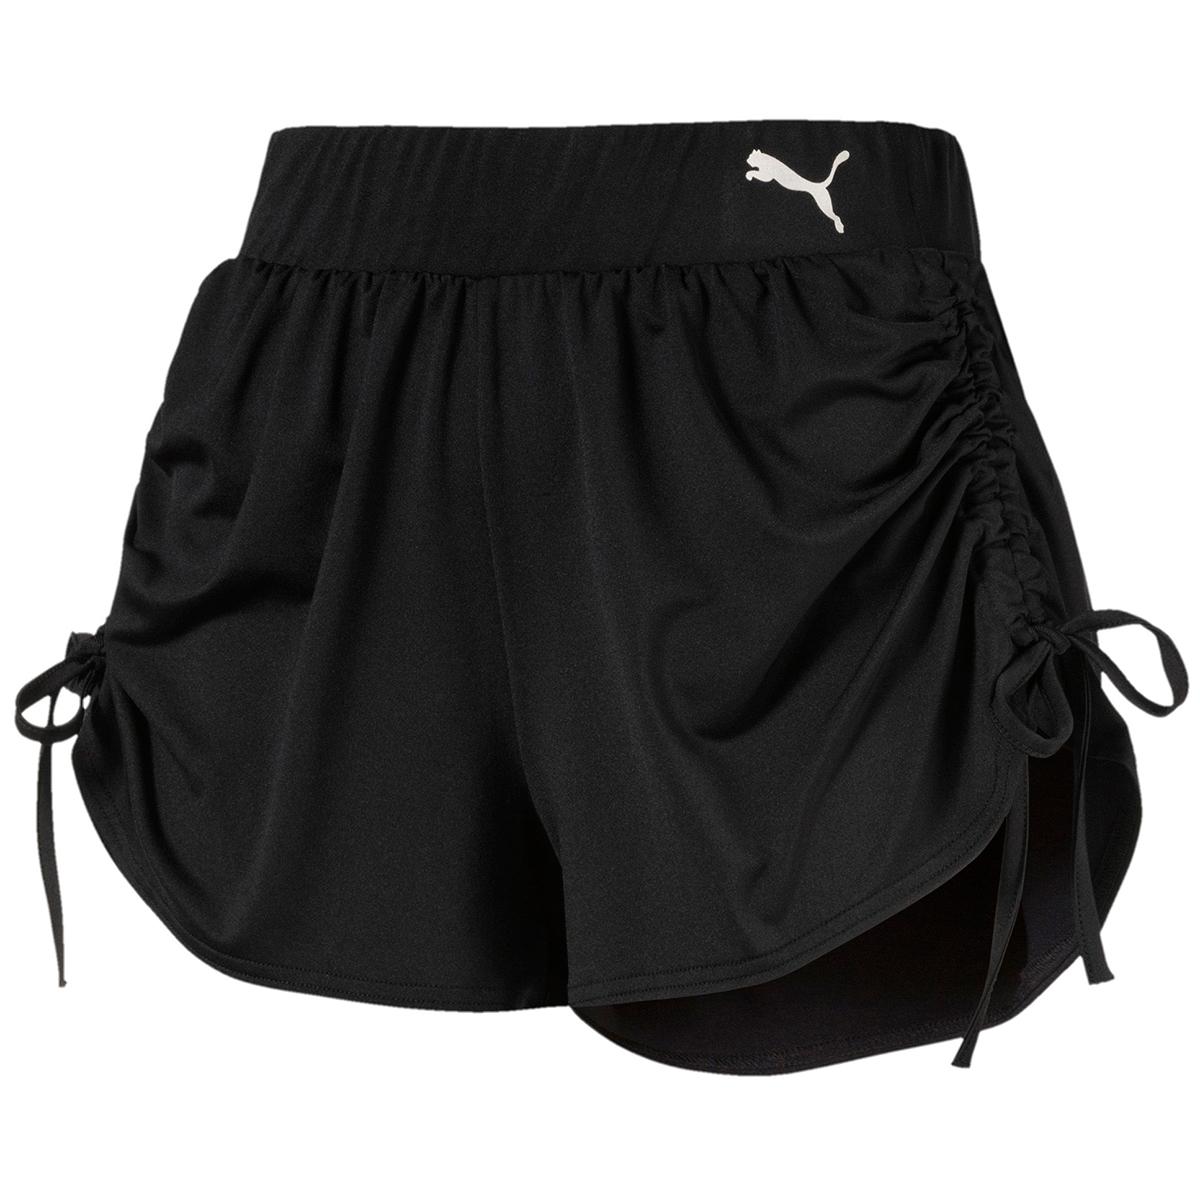 Puma Women's Transition Shorts - Black, XL